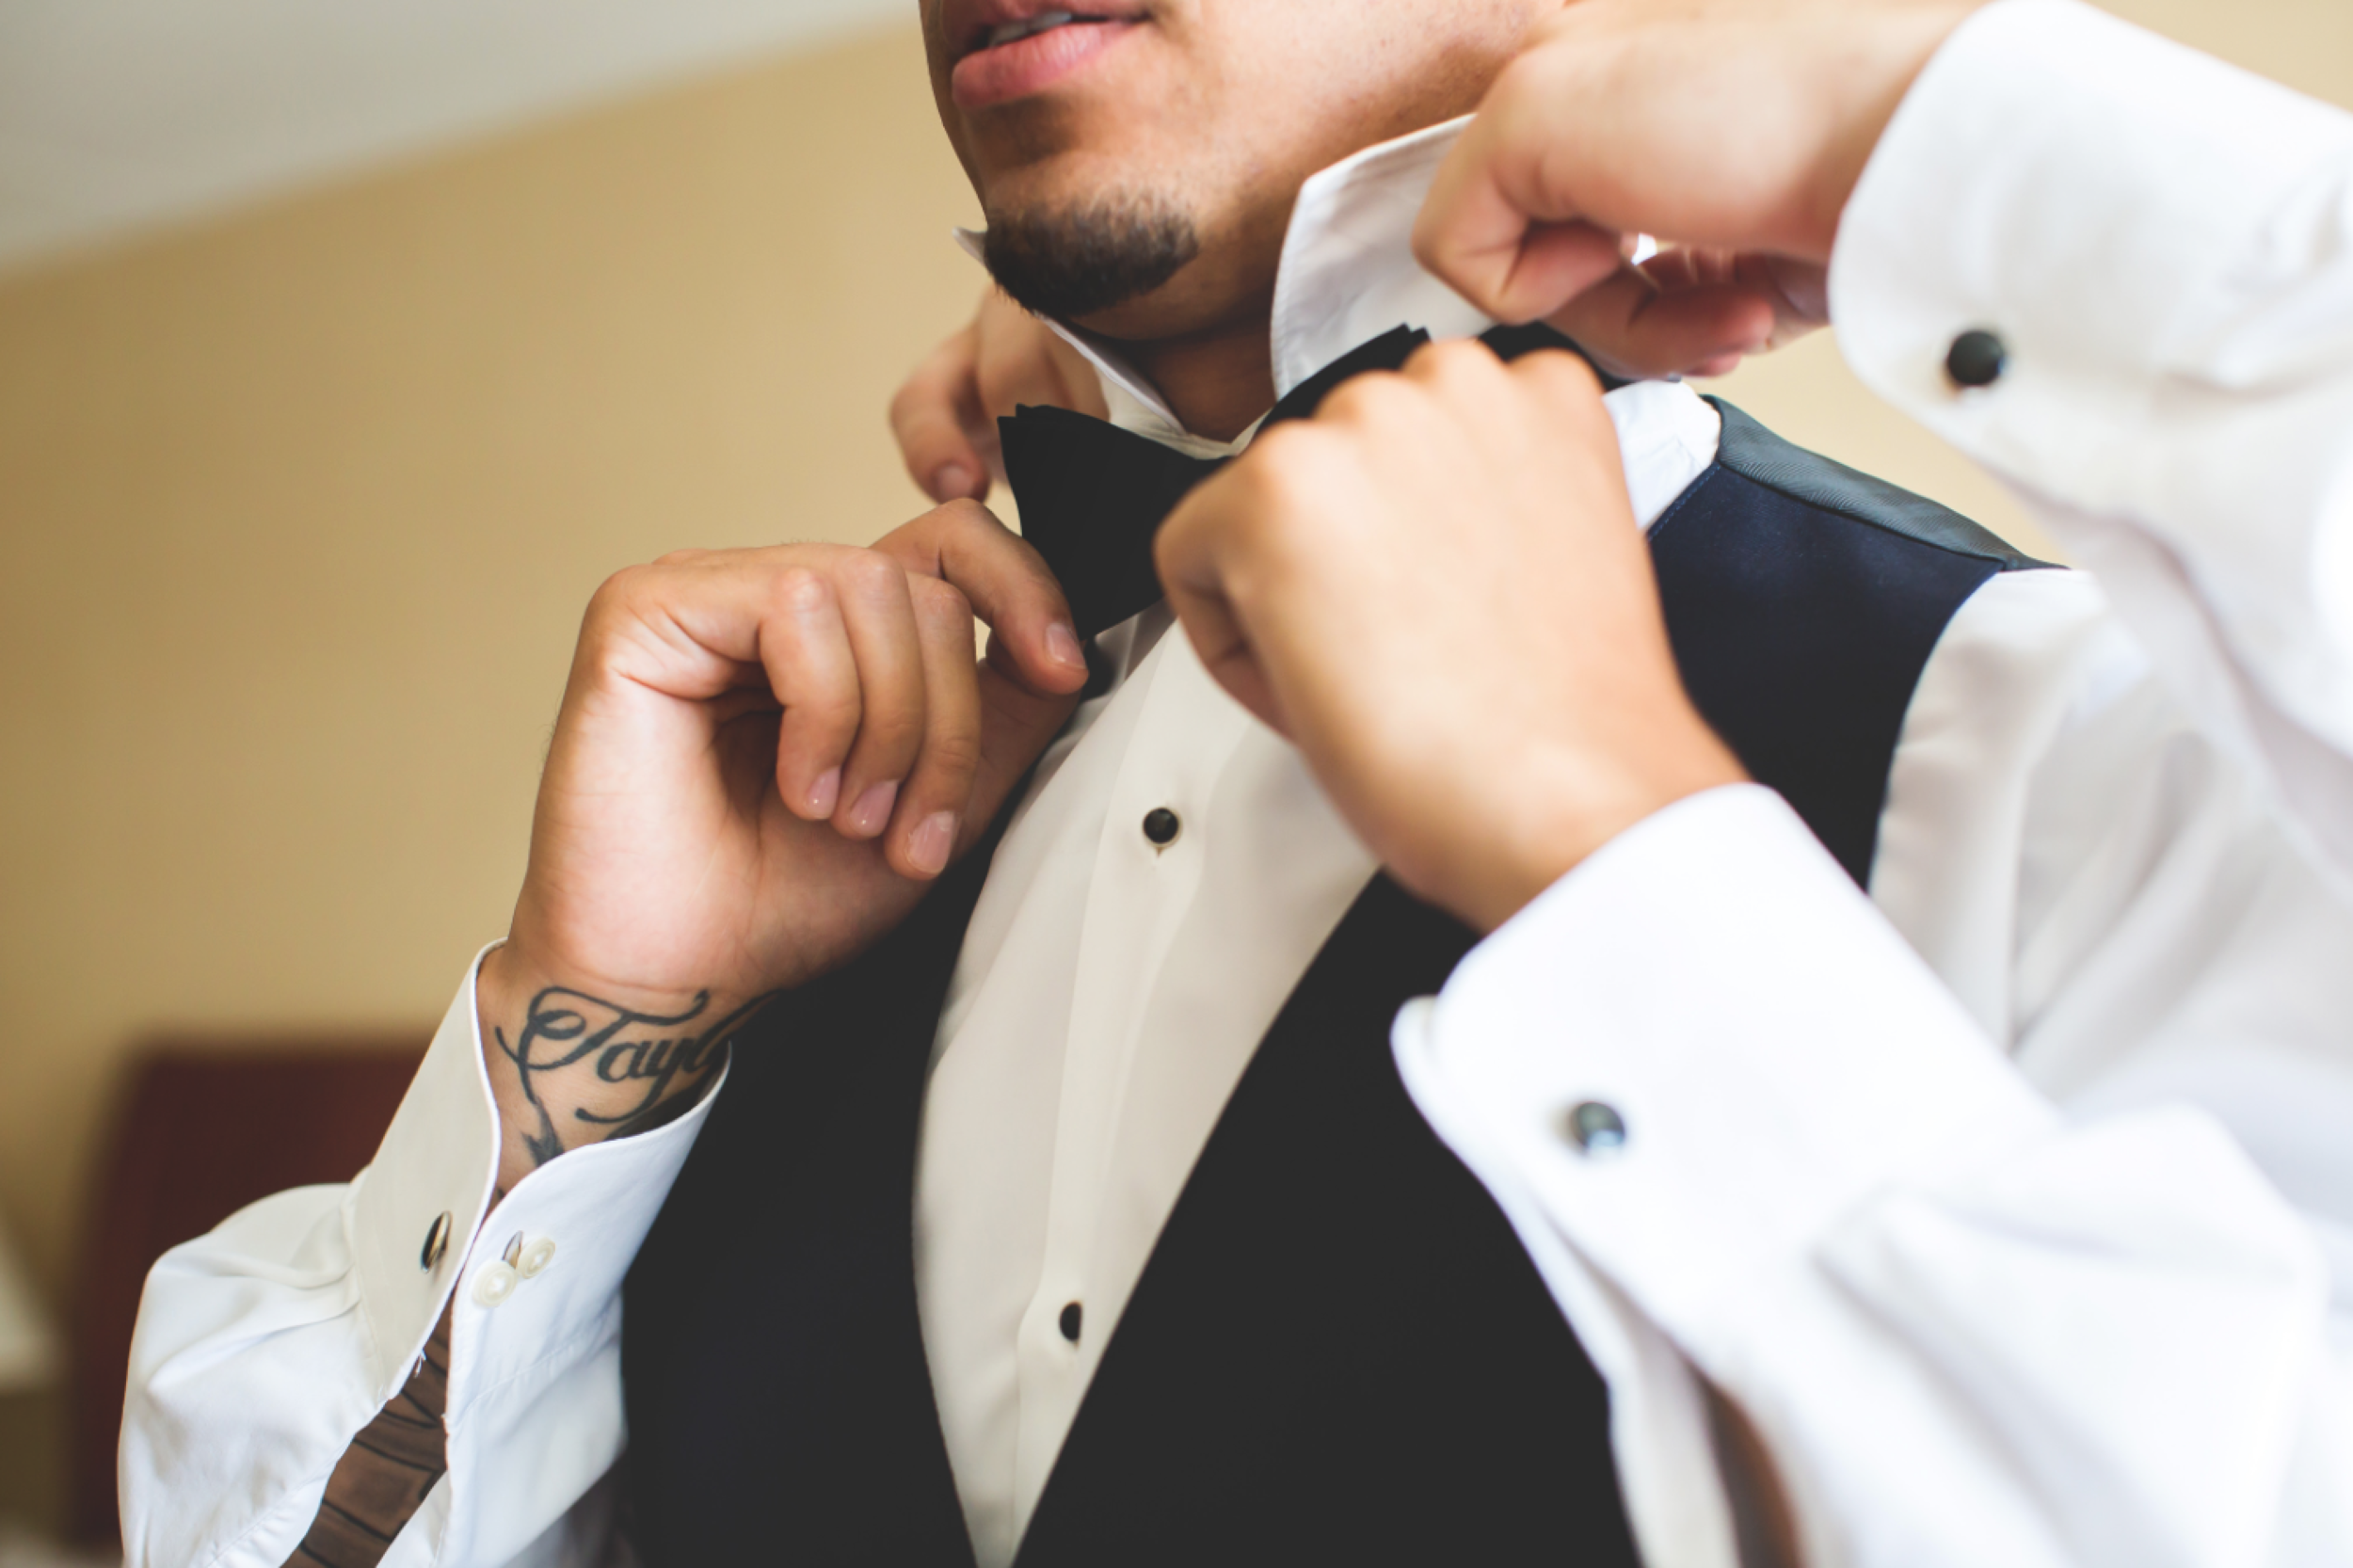 Wedding-Burlington-Convention-Center-Burlington-Oakville-Toronto-Hamilton-Niagara-Wedding-Photographer-Photography-Moments-by-Lauren-Photo-Image-13.png